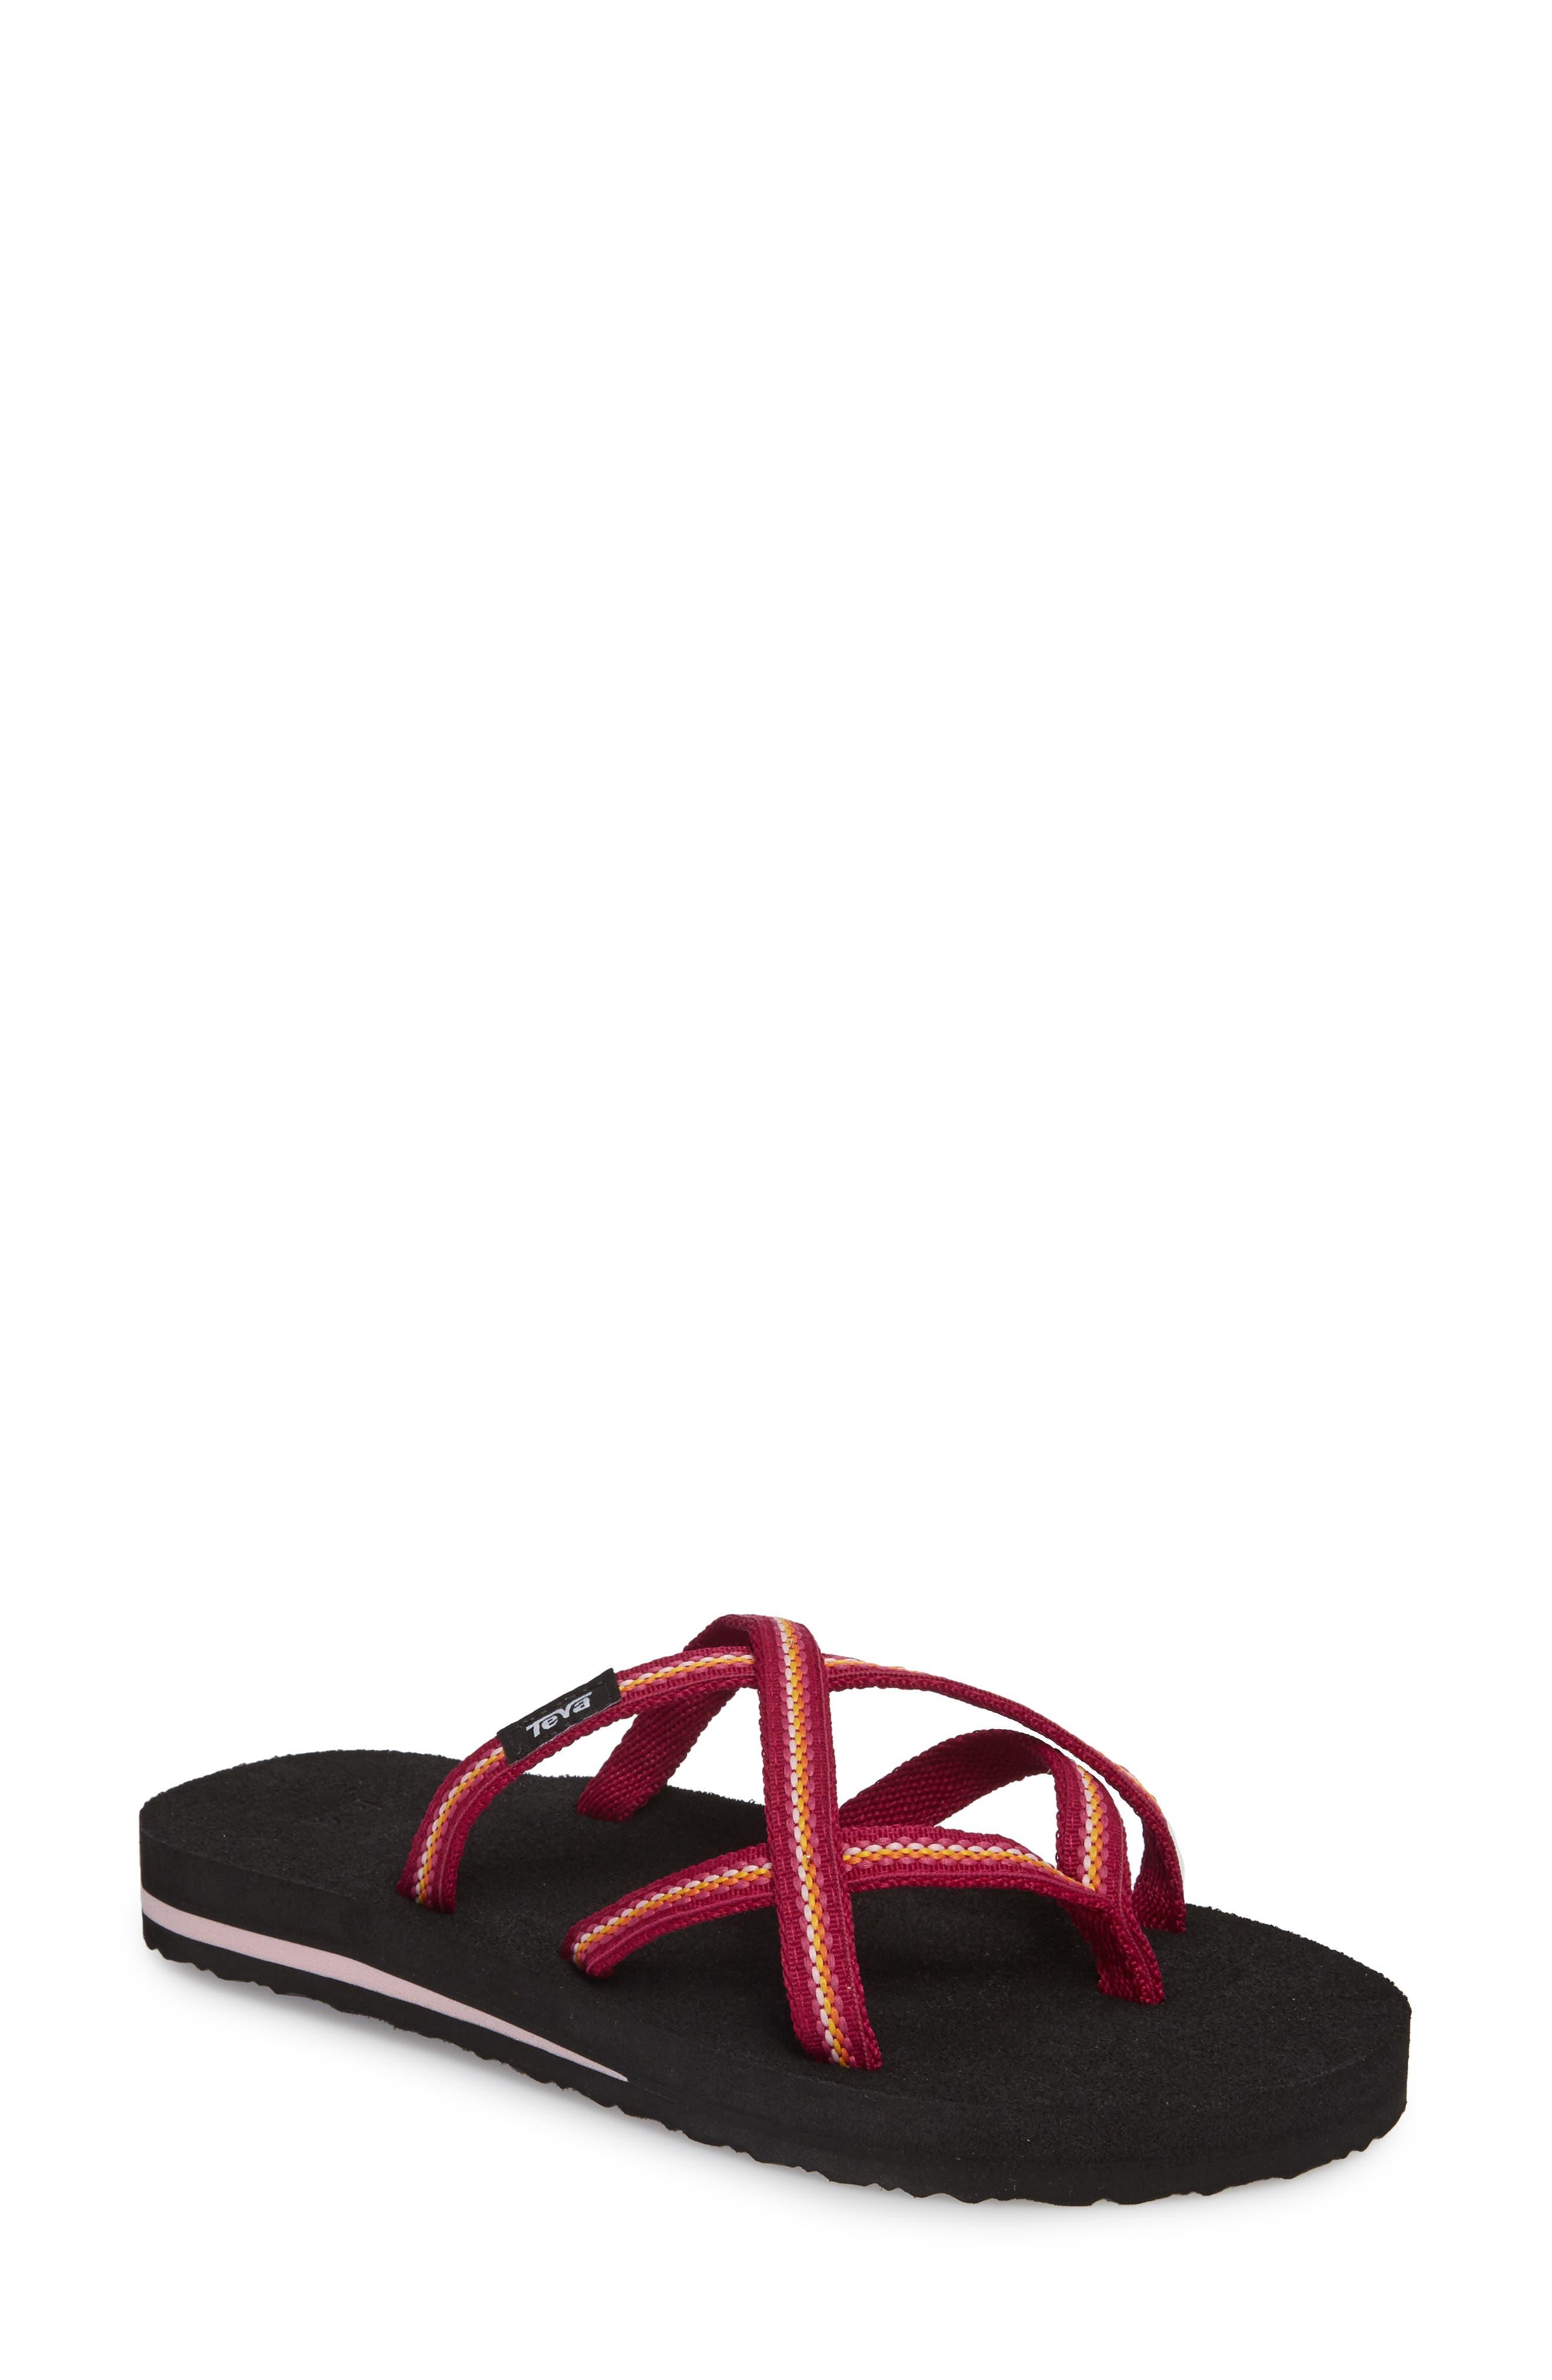 'Olowahu' Sandal,                             Main thumbnail 1, color,                             BOYSENBERRY FABRIC